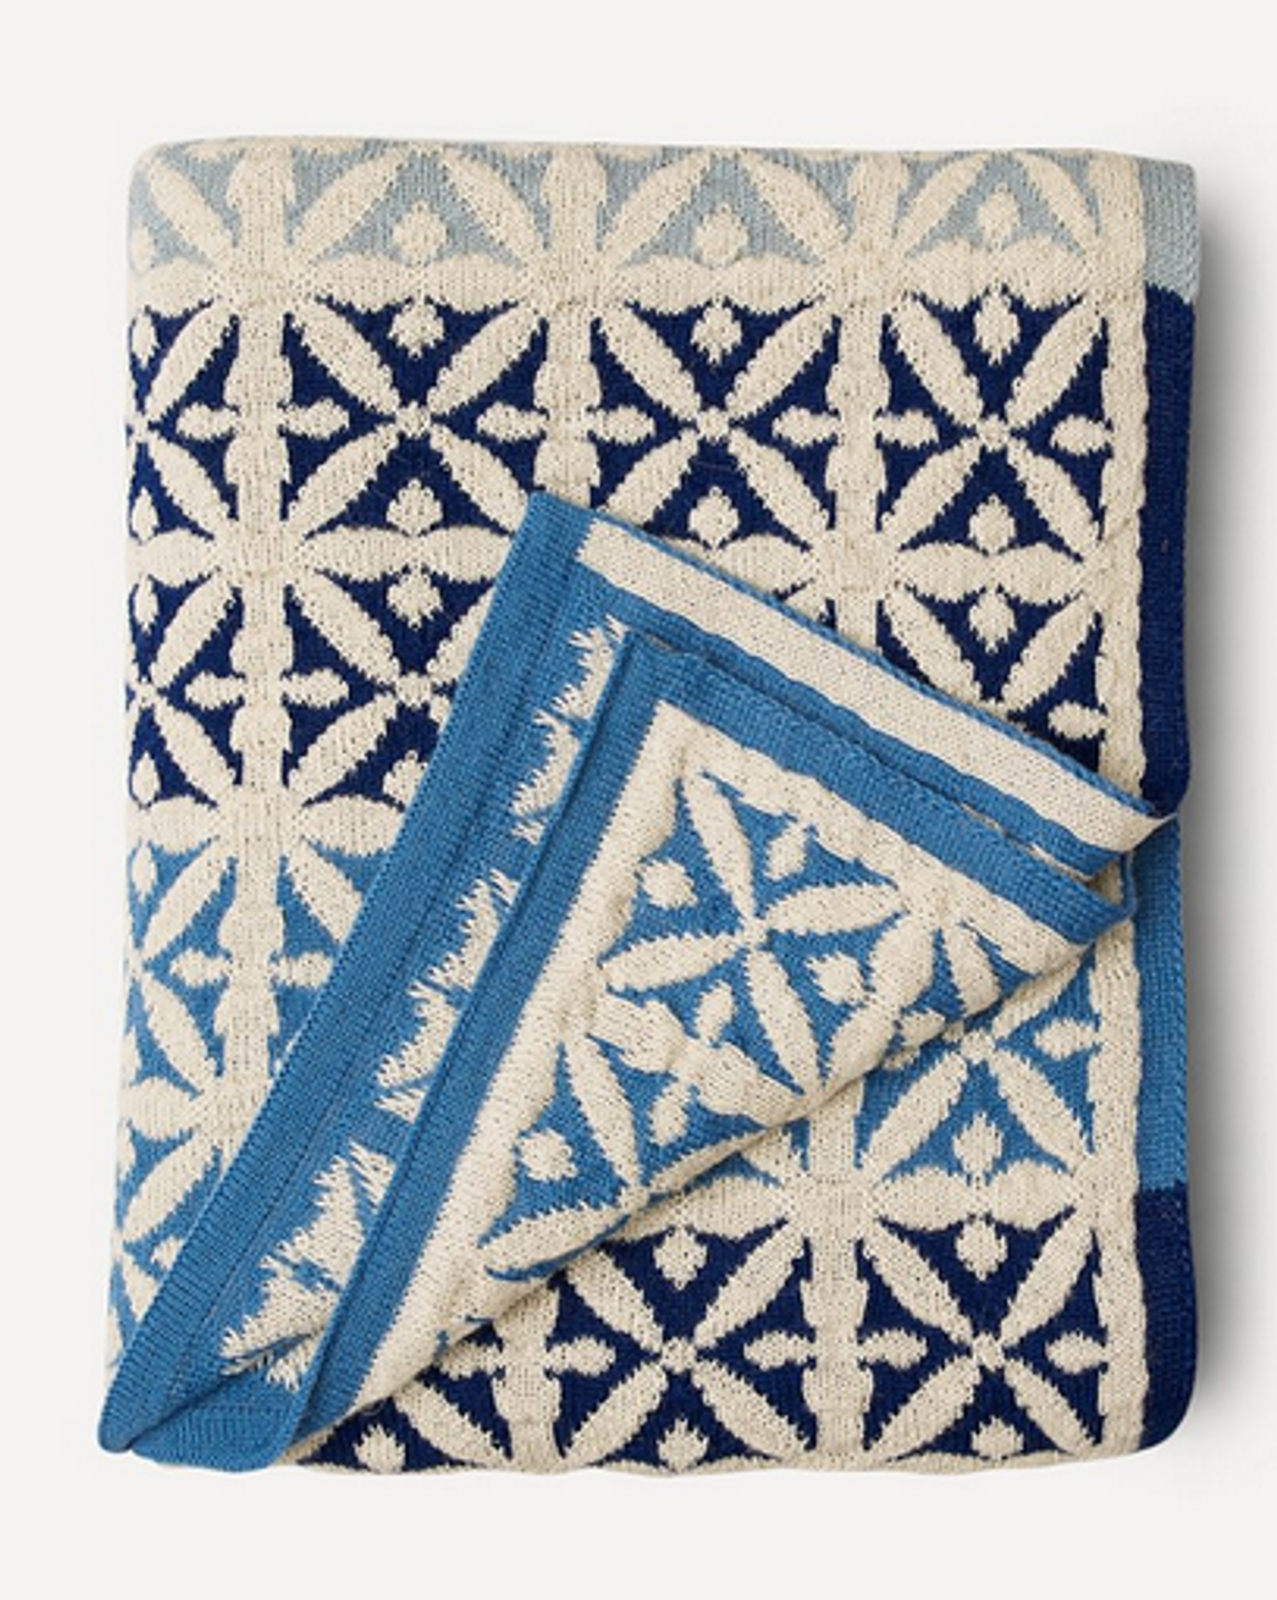 Agneta Oleana Knitted Blanket, 427F Blue/White